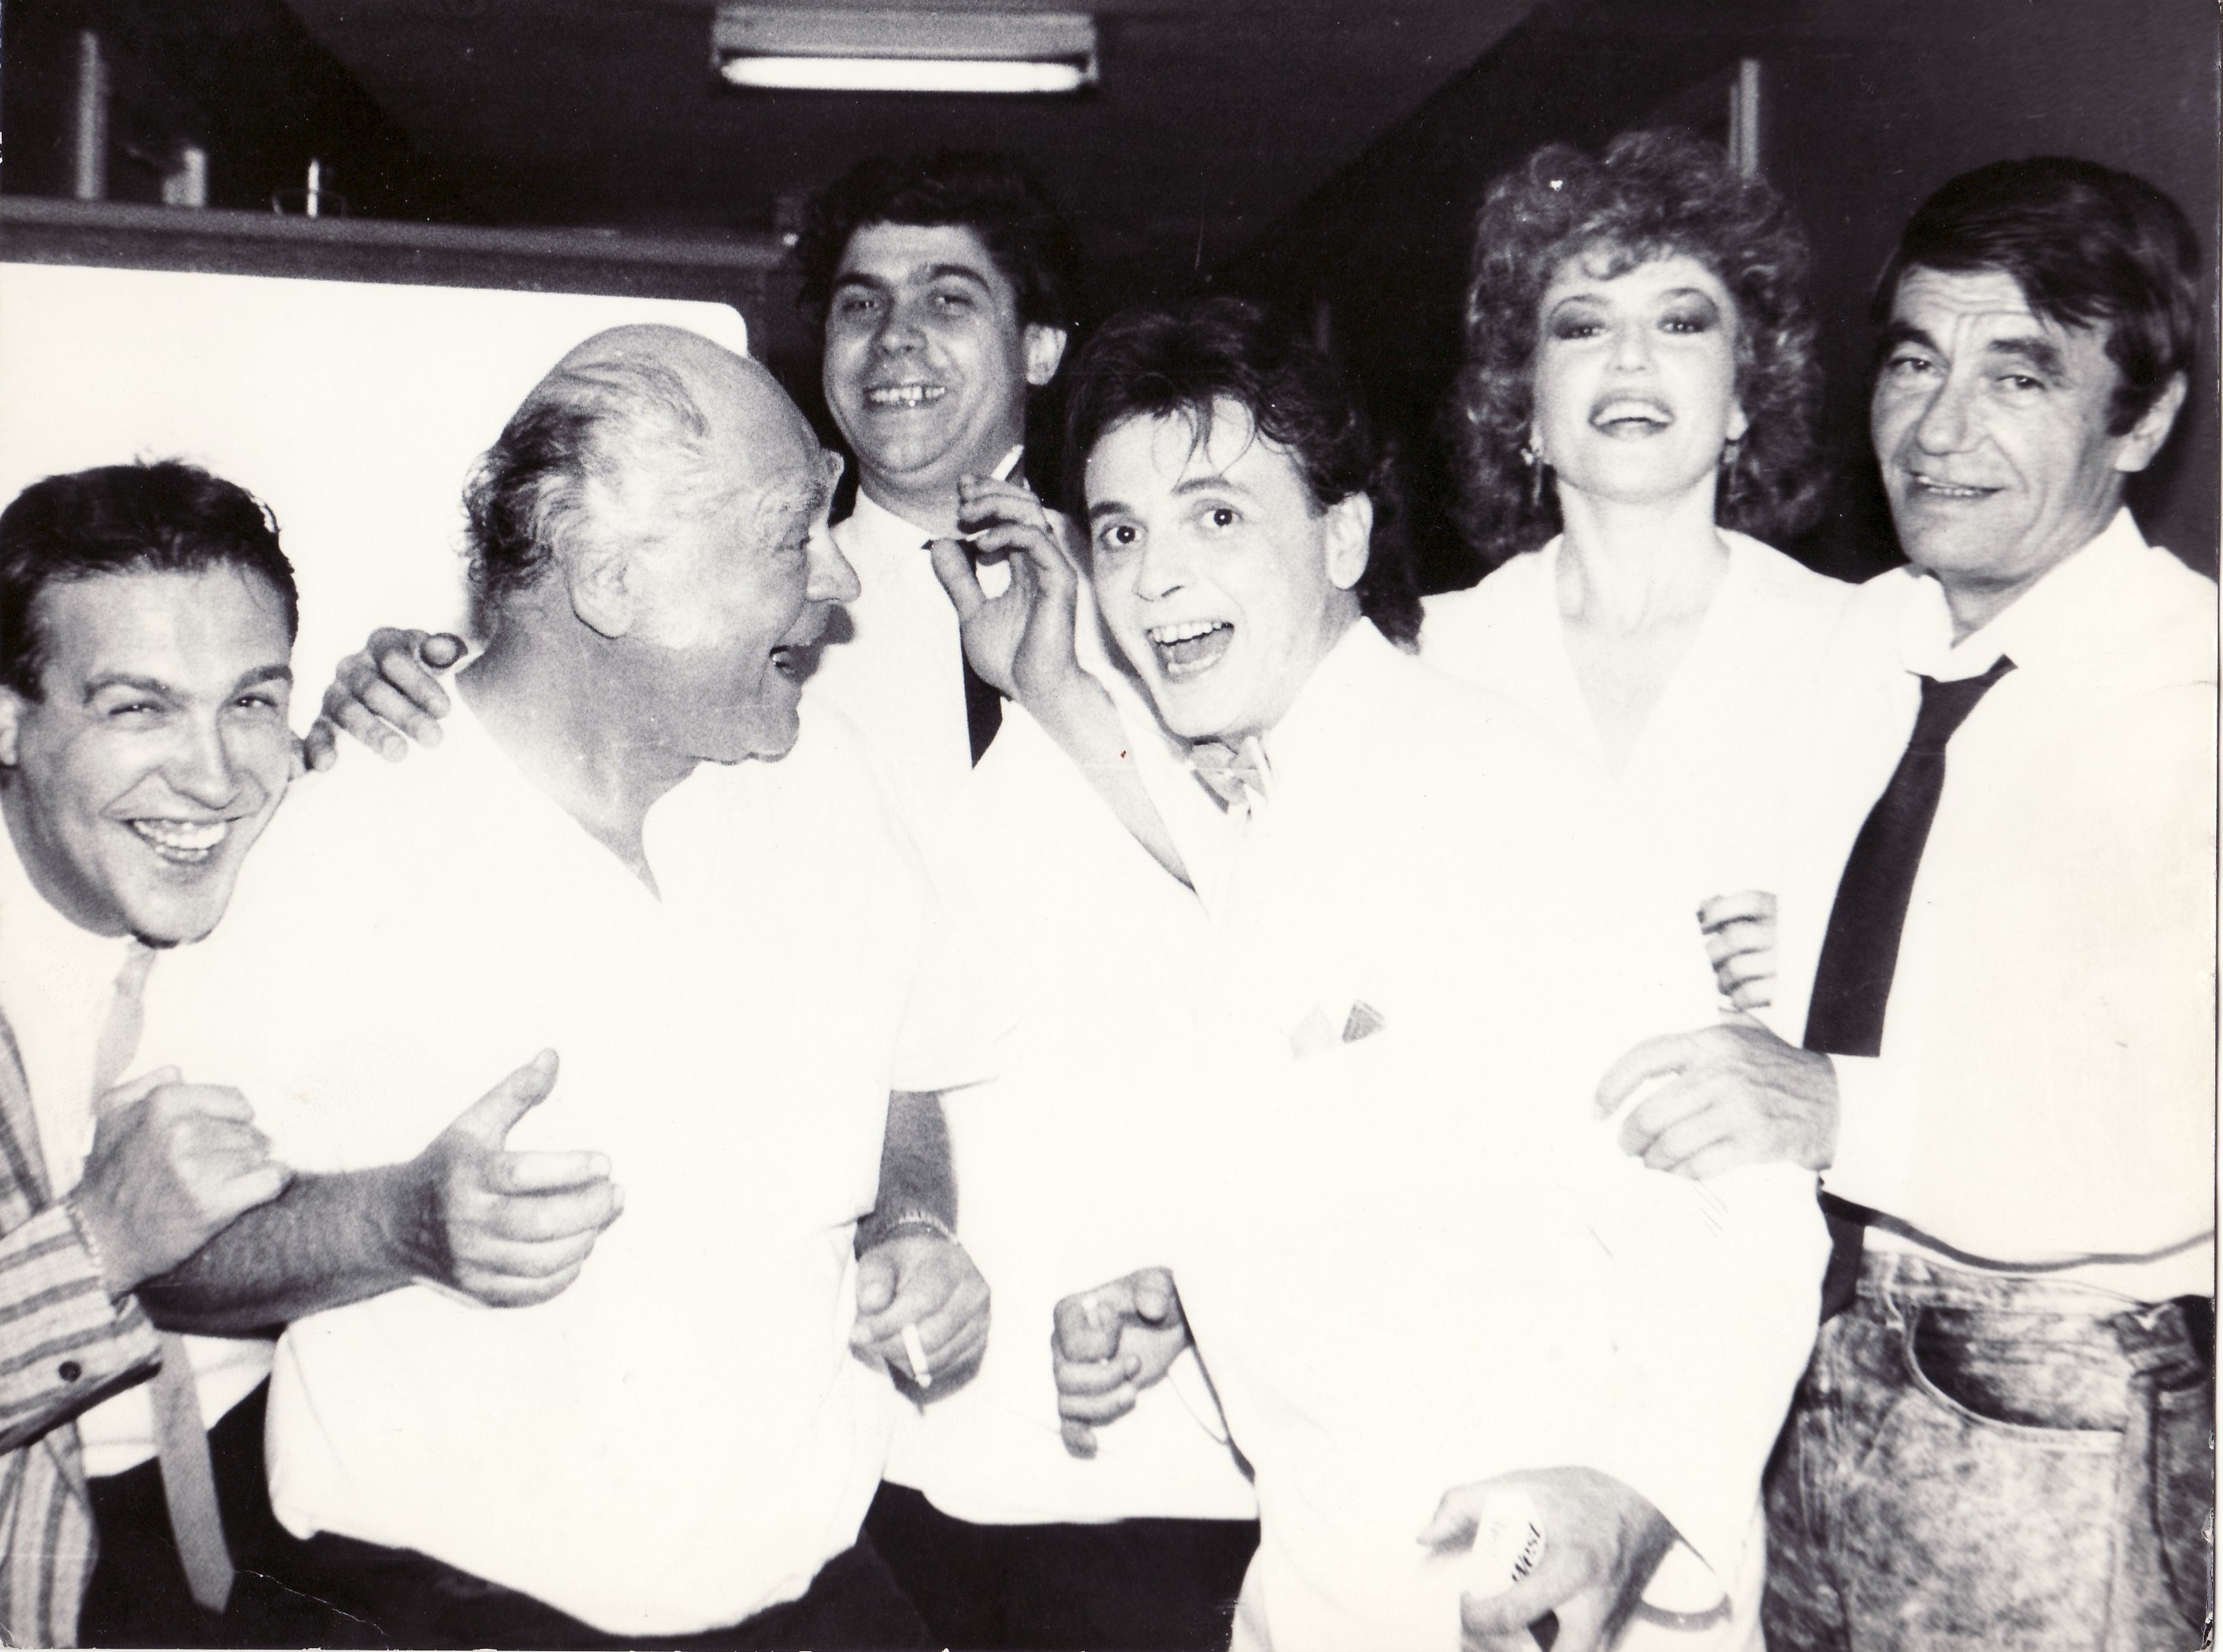 Mamaia'88 - Gabriel Cotabiţă, George Grigoriu, Ionel Tudor, Adrian Daminescu, Corina Chiriac, Dan Spataru (arhivă Corina Chiriac)